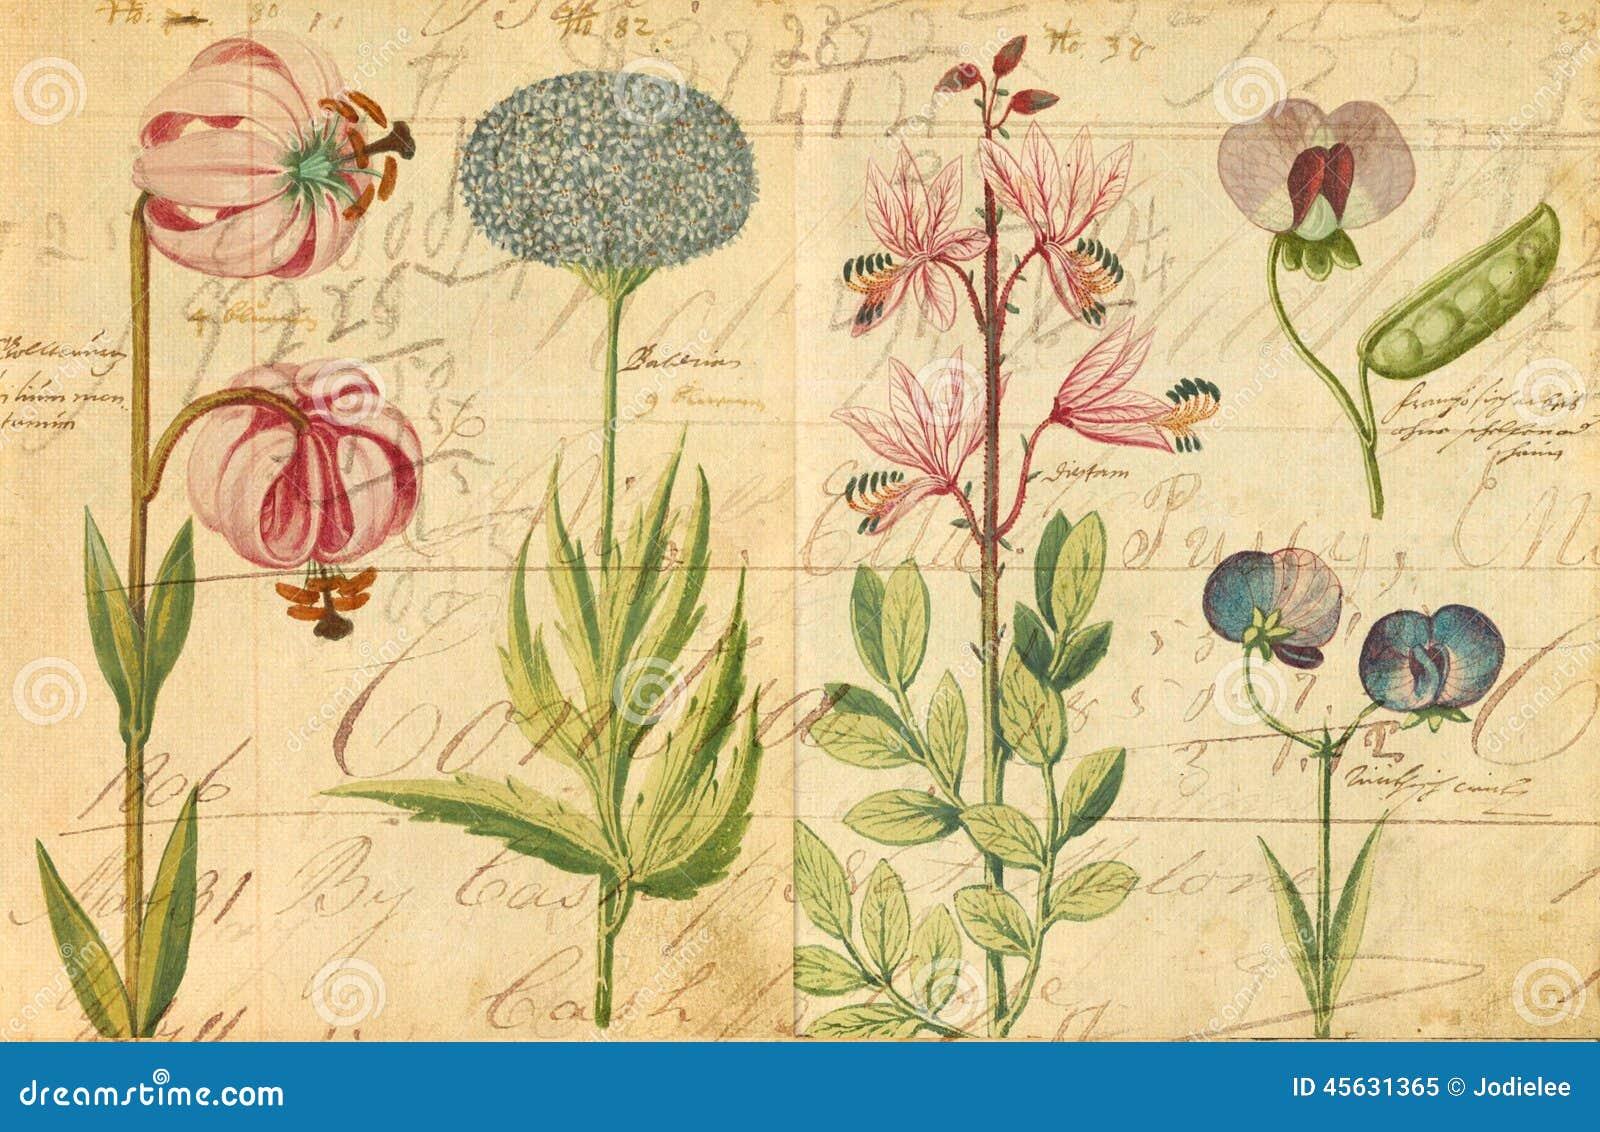 Pared Botanica Antigua Art Print Illustration Stock De Ilustracion